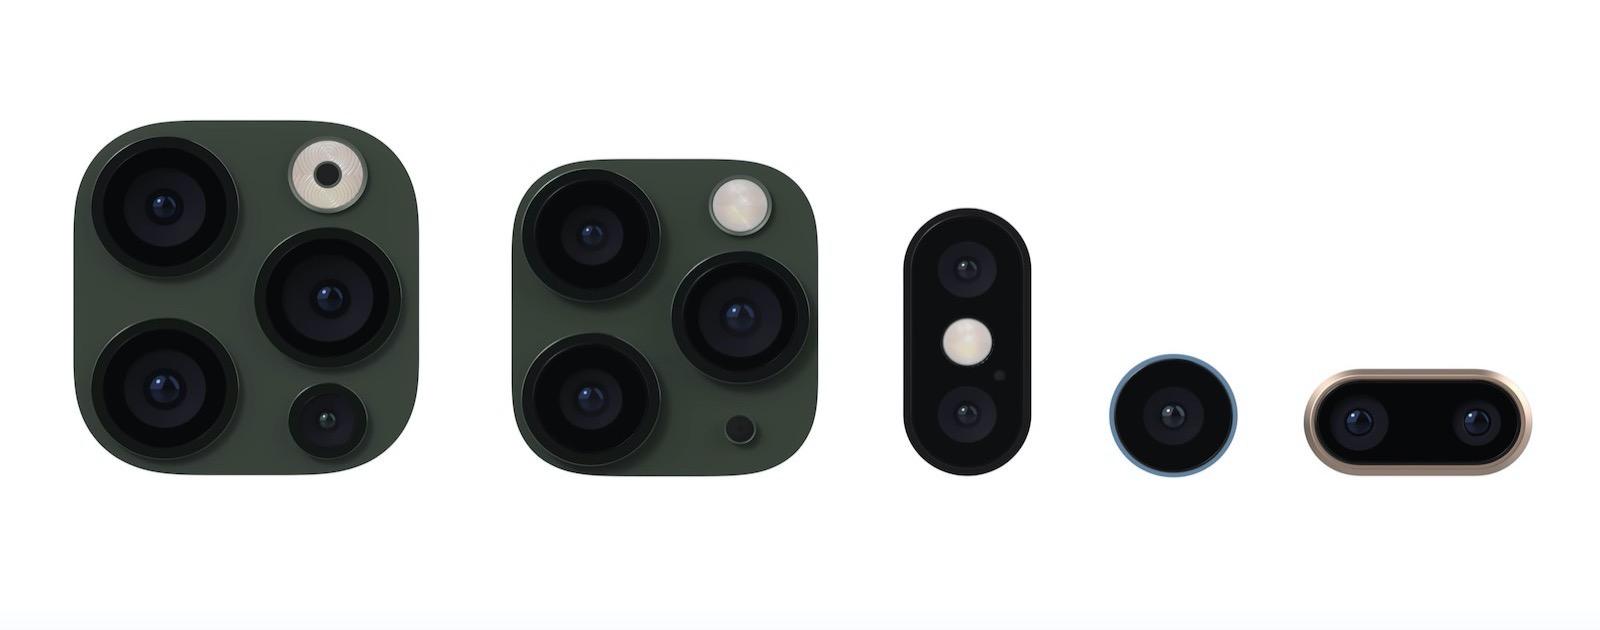 iphone-12-lens-size-bigger.jpg